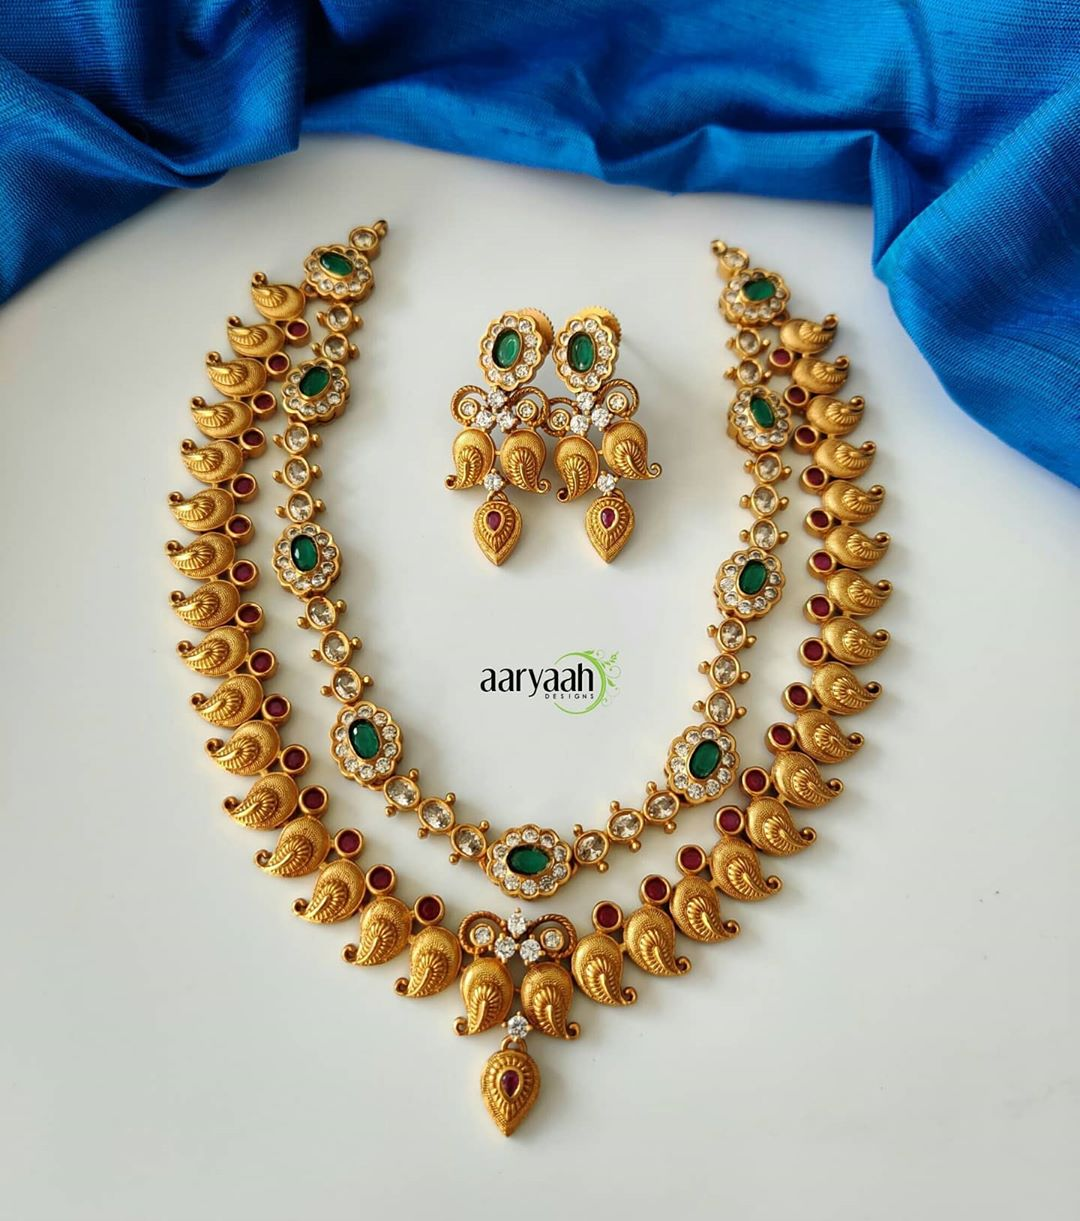 matte-gold-alike-cutwork-necklace